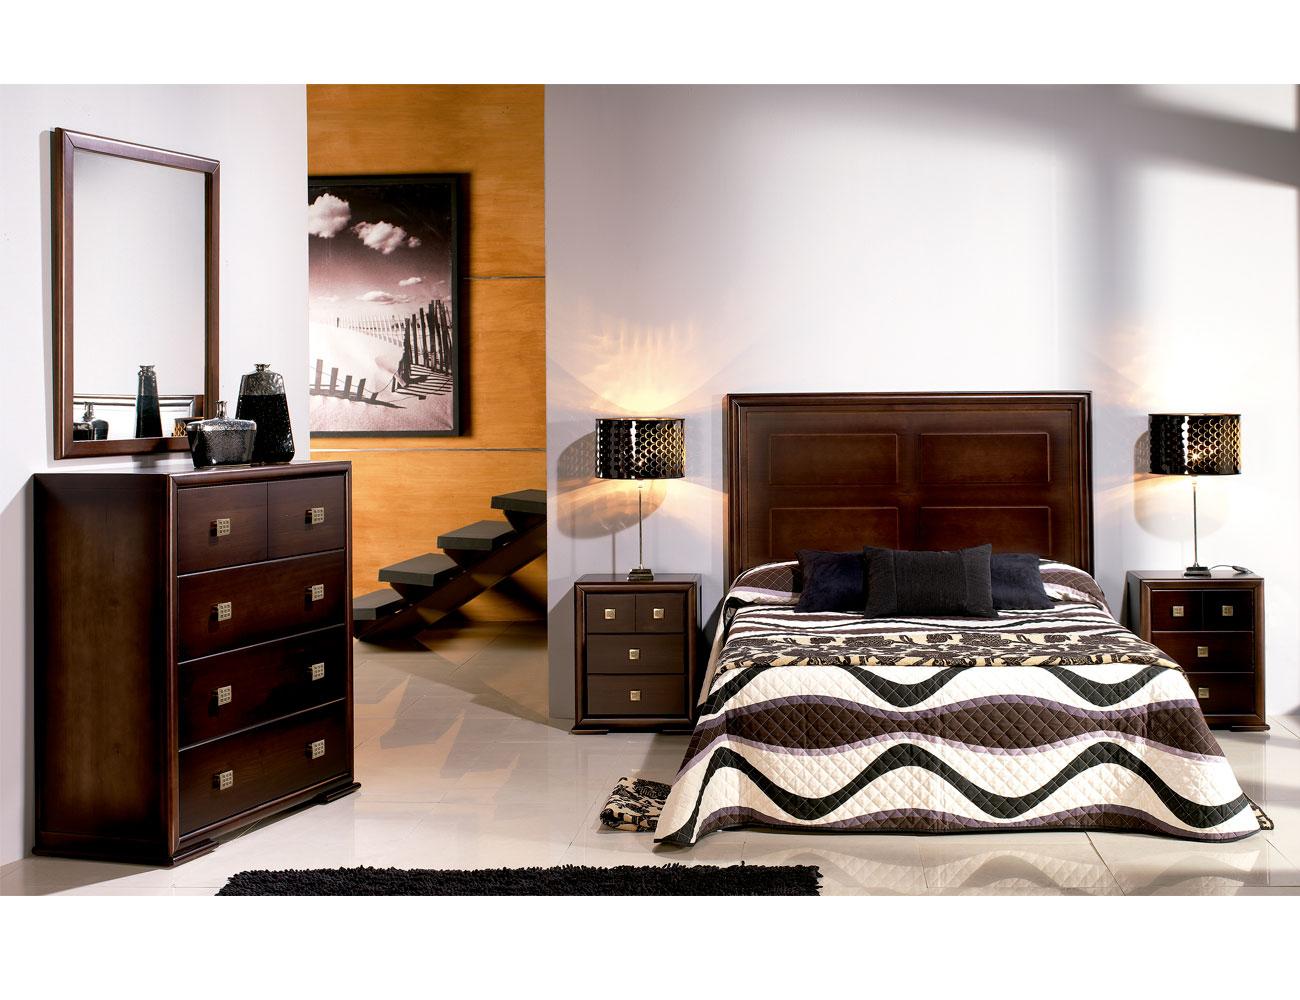 Composicion01 dormitorio matrimonio comoda madera